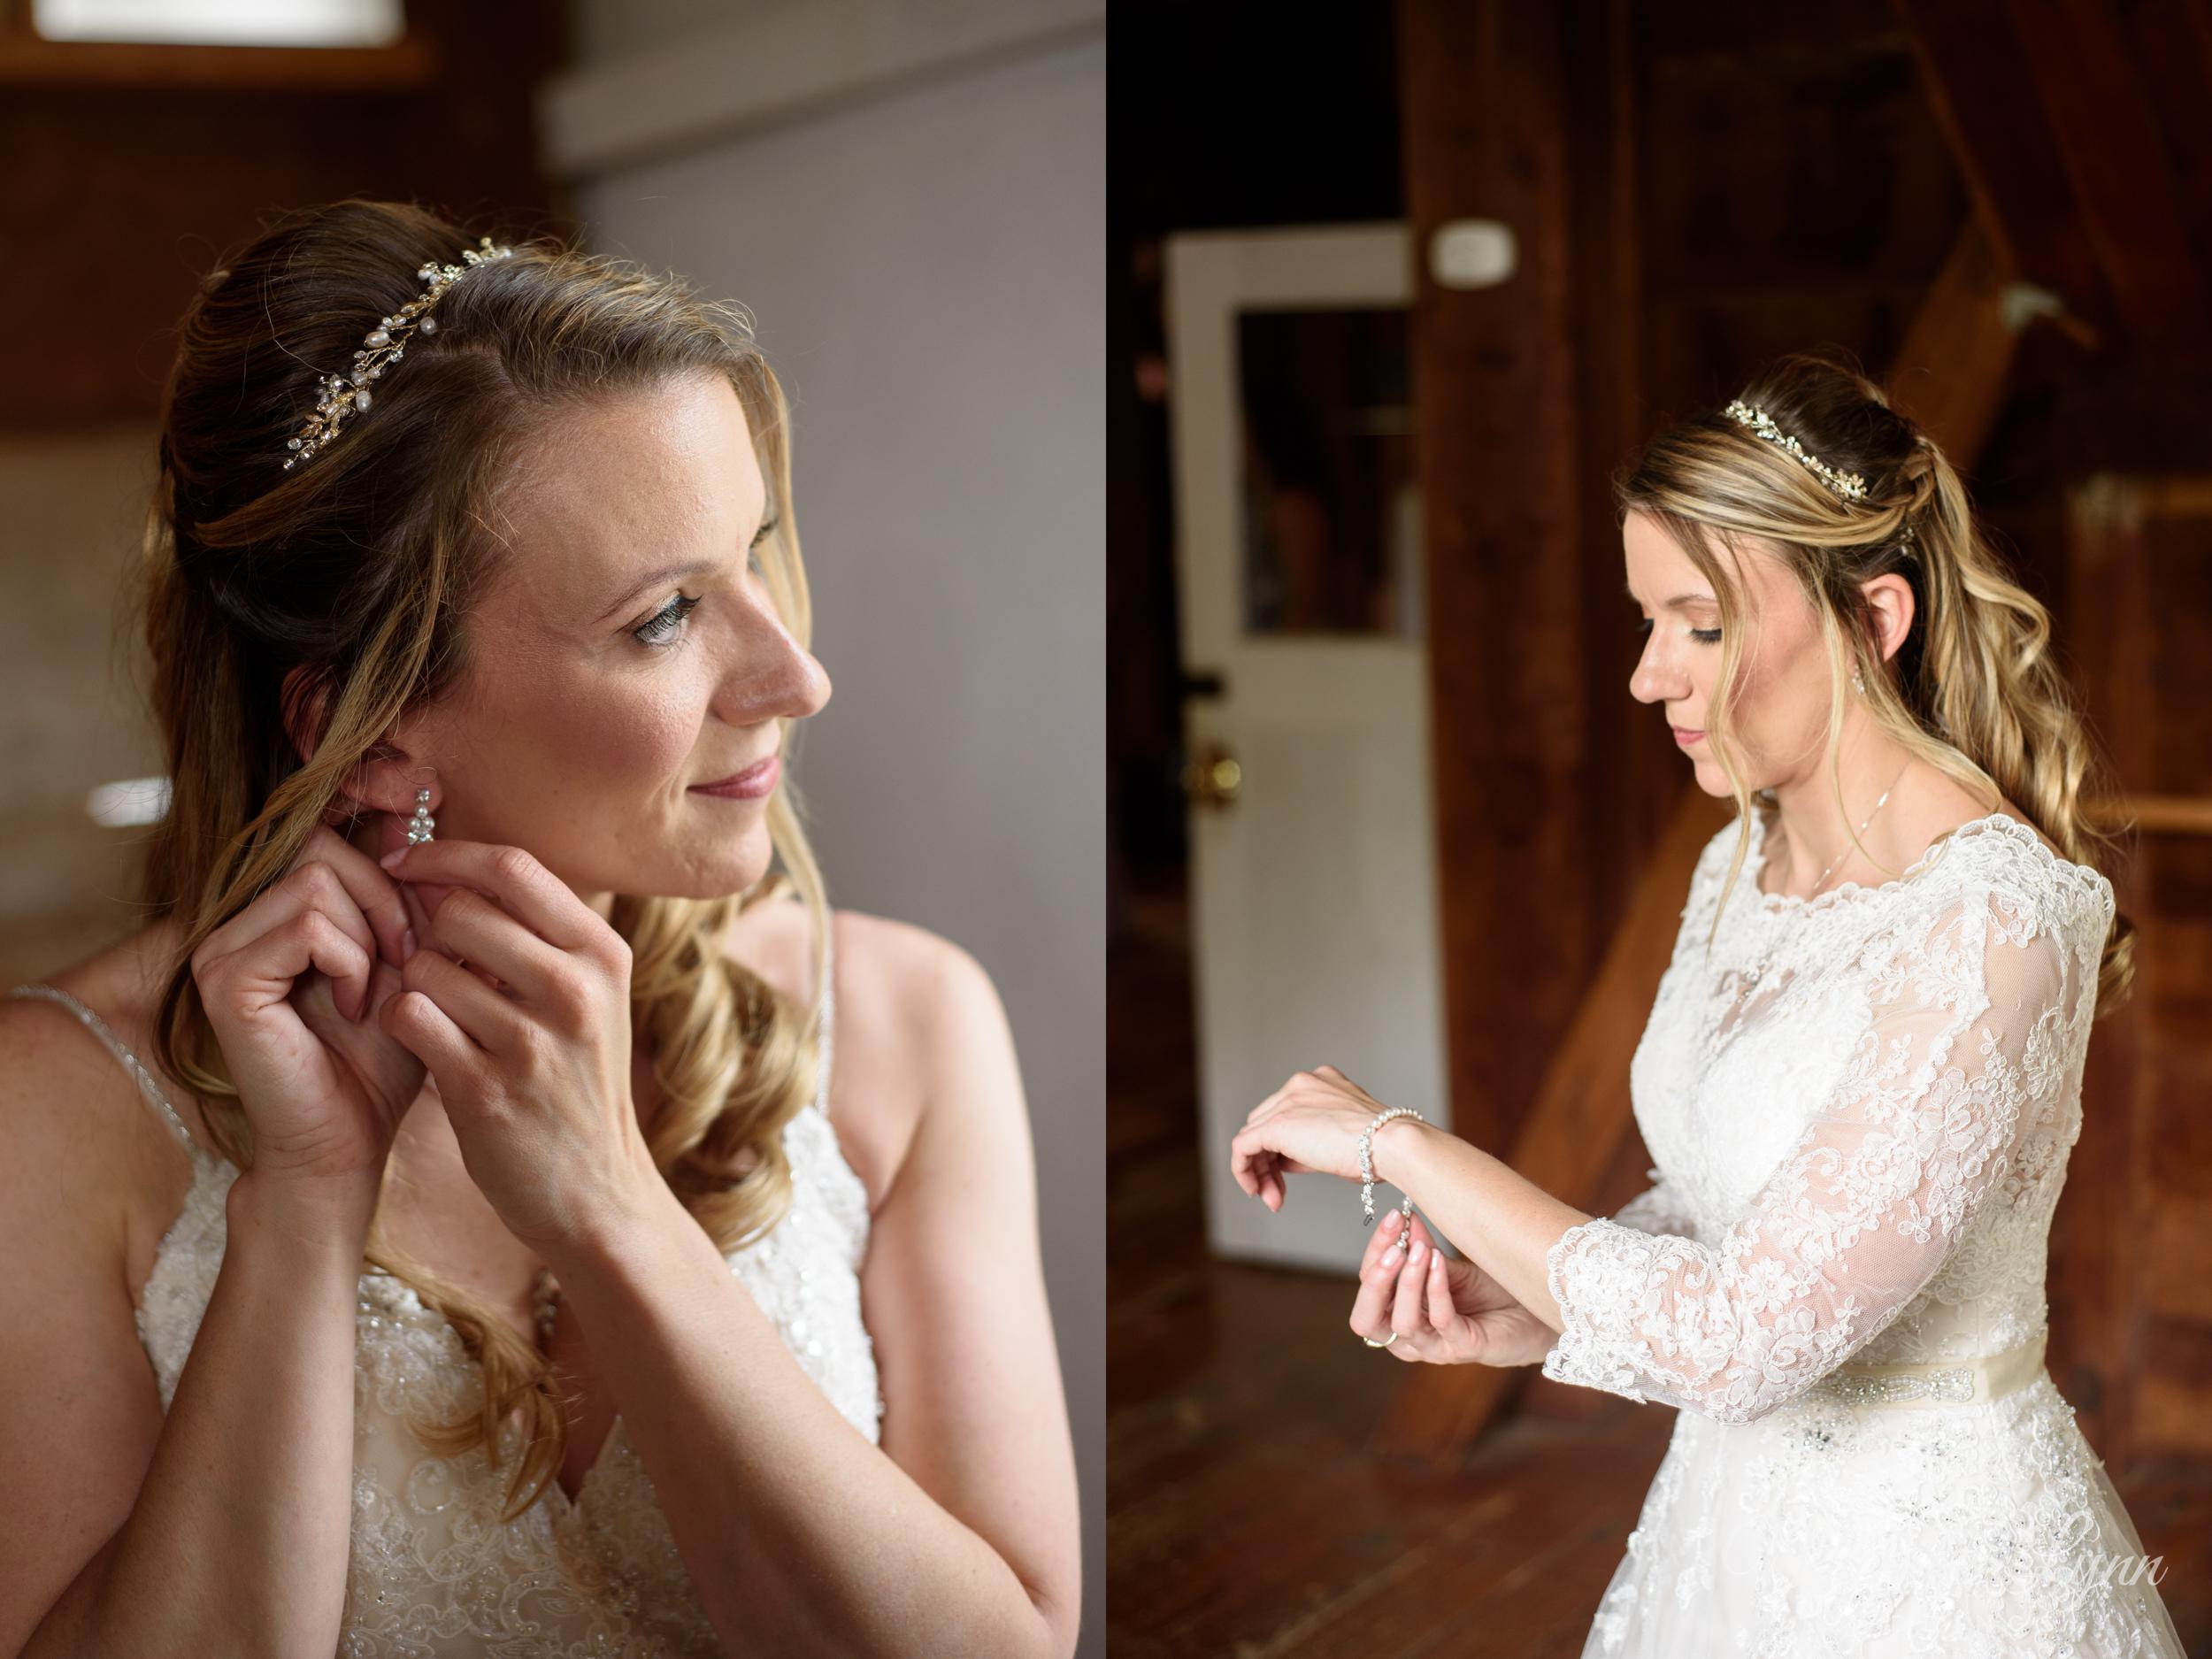 mlw-prallsville-mills-nj-wedding-photographer-8.jpg